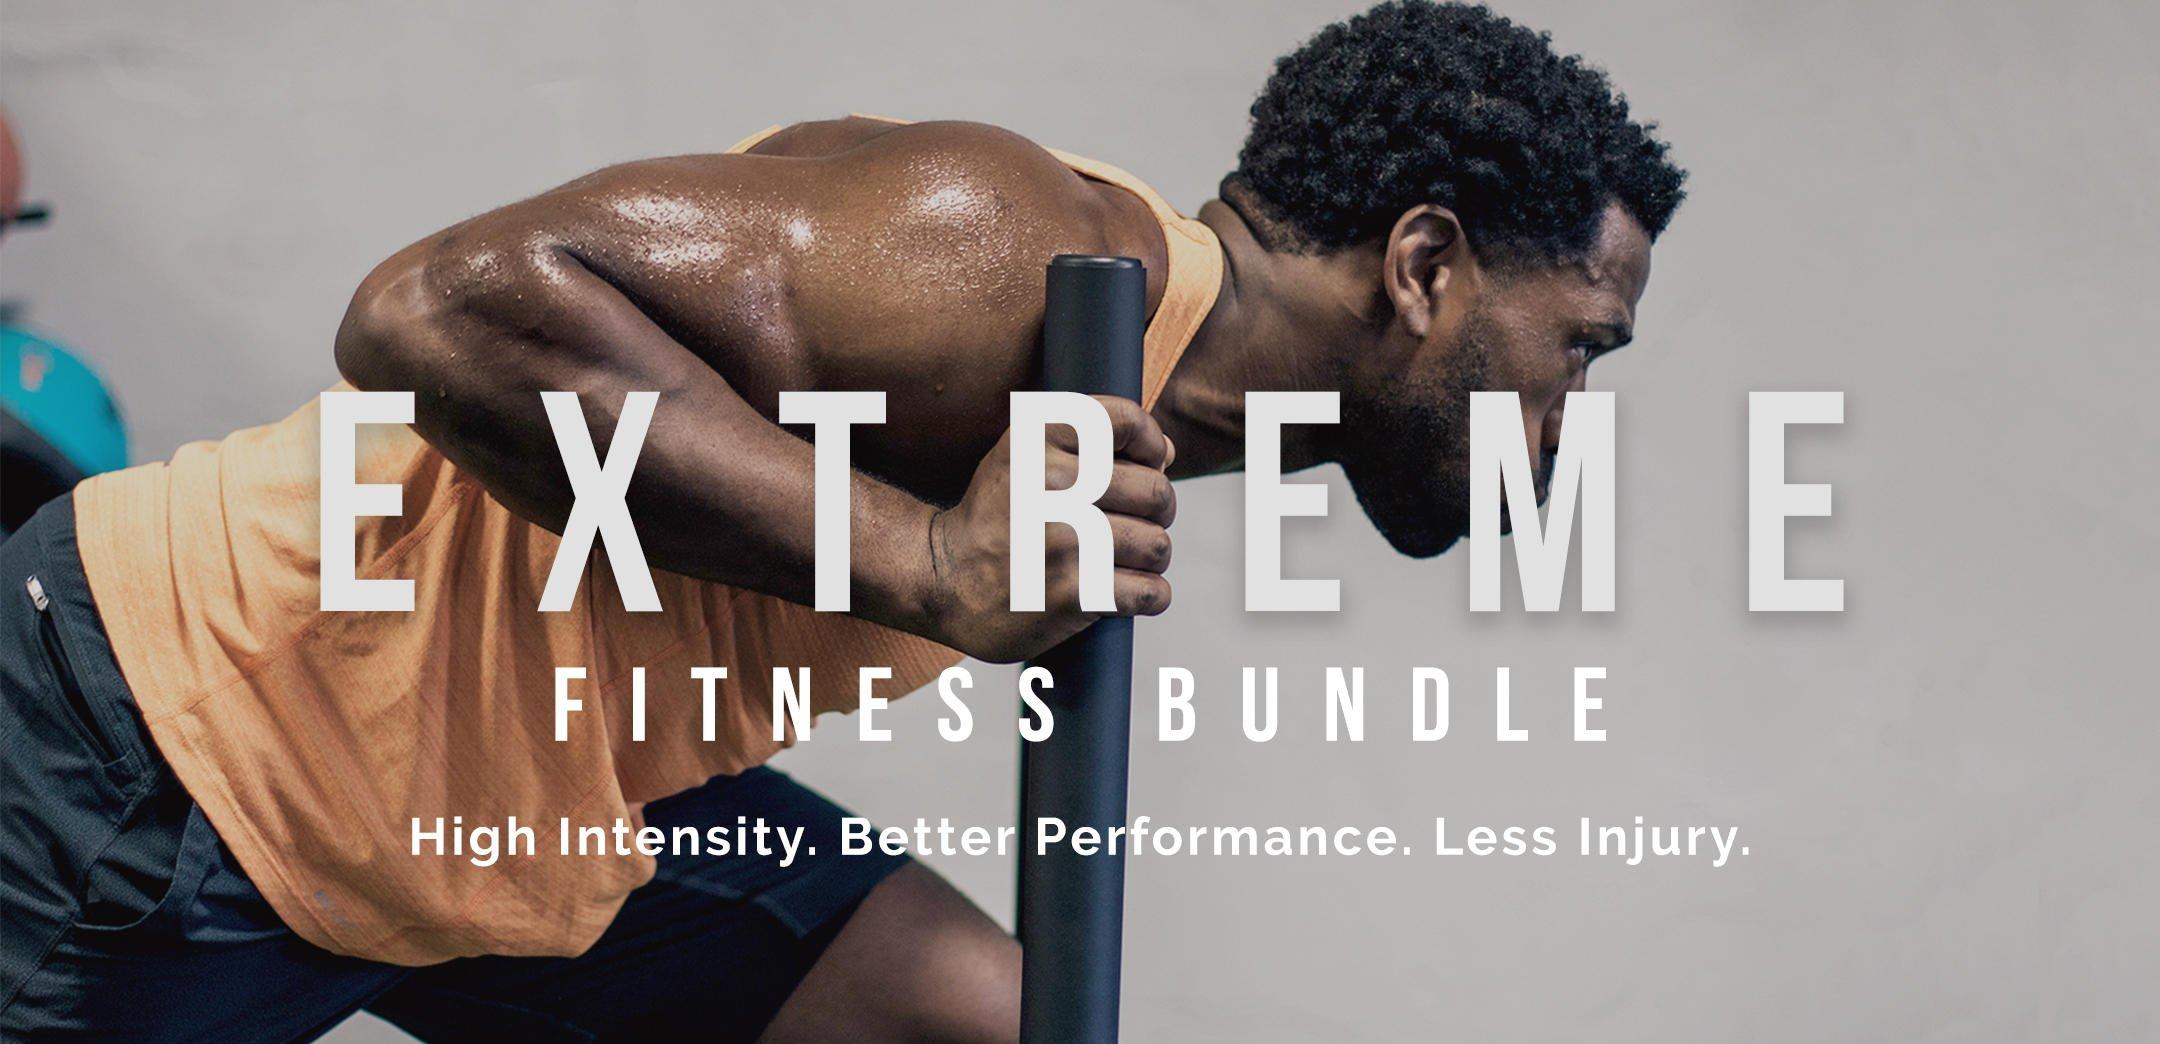 Extreme Fitness image